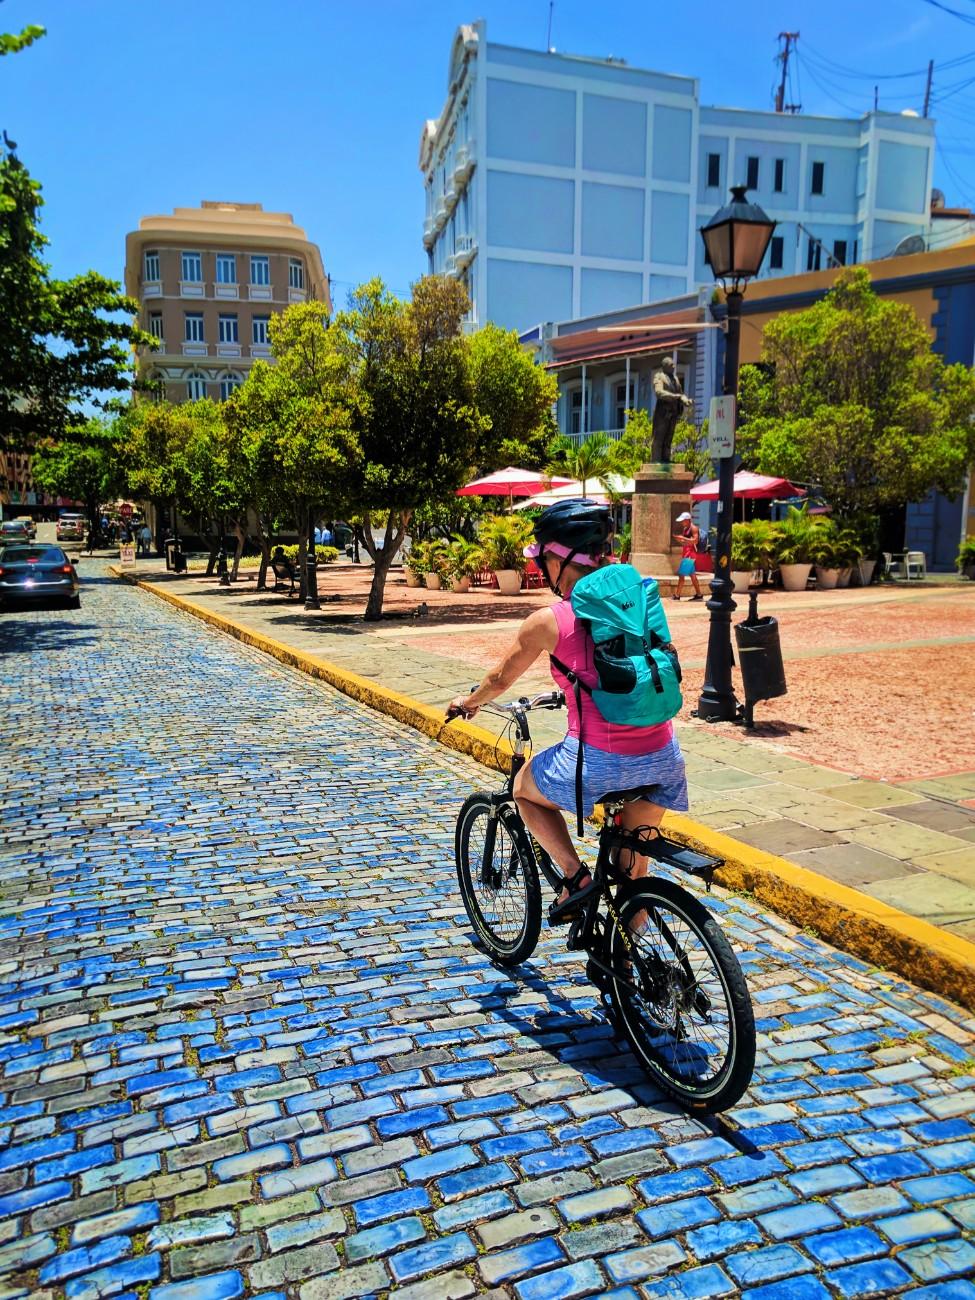 Maureen biking through Plaza Malecon in Old San Juan Puerto Rico 1